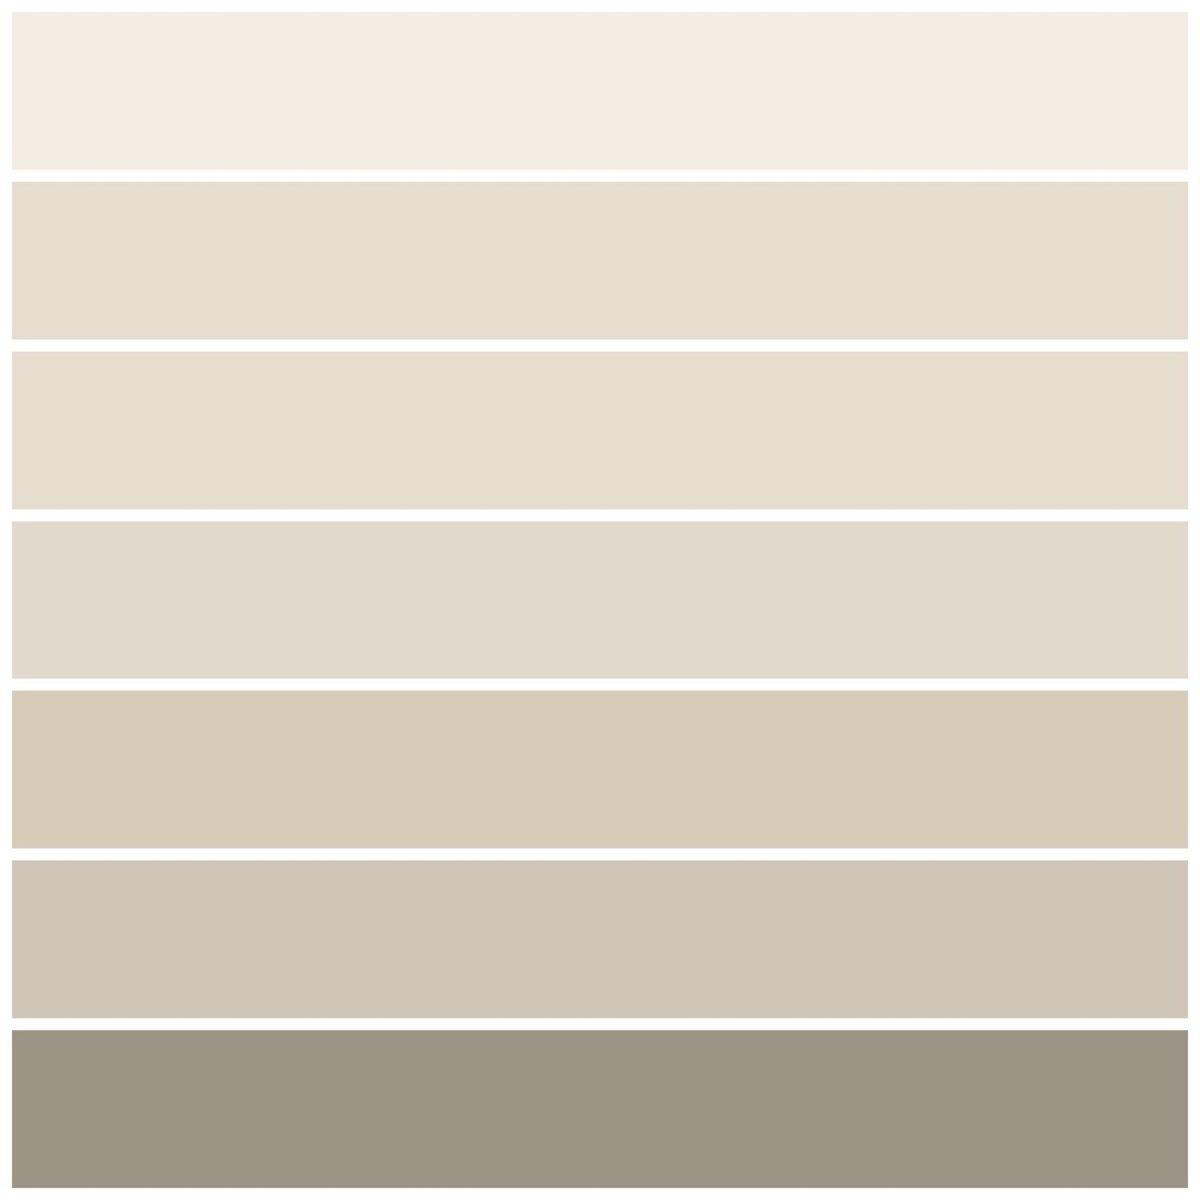 cucina-pareti-color-sabbia-9